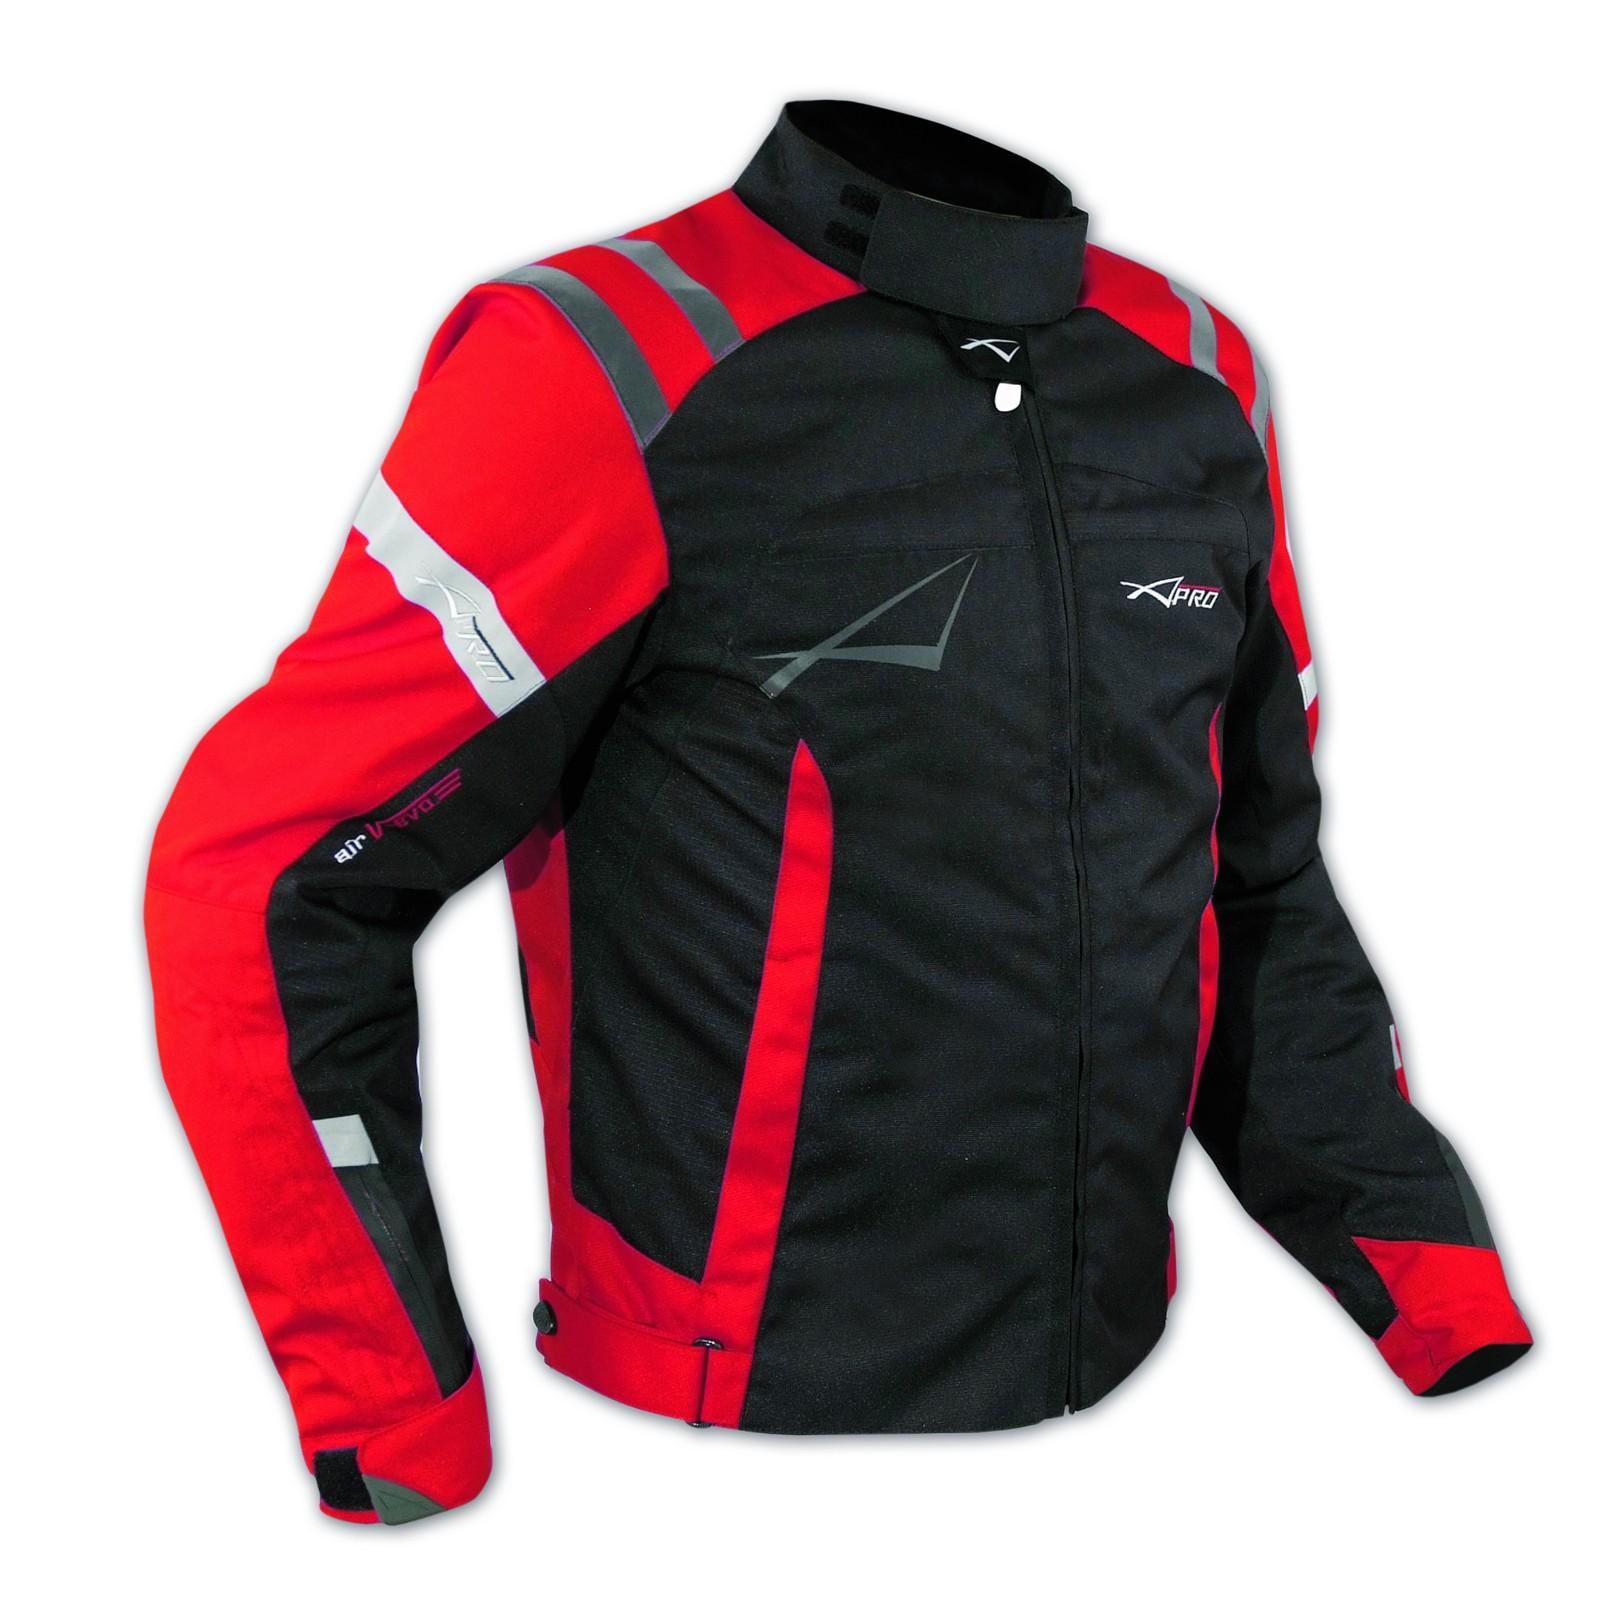 Giacca Sport Touring Tessuto Moto Cordura CE Protezioni Sfoderabile Rosso